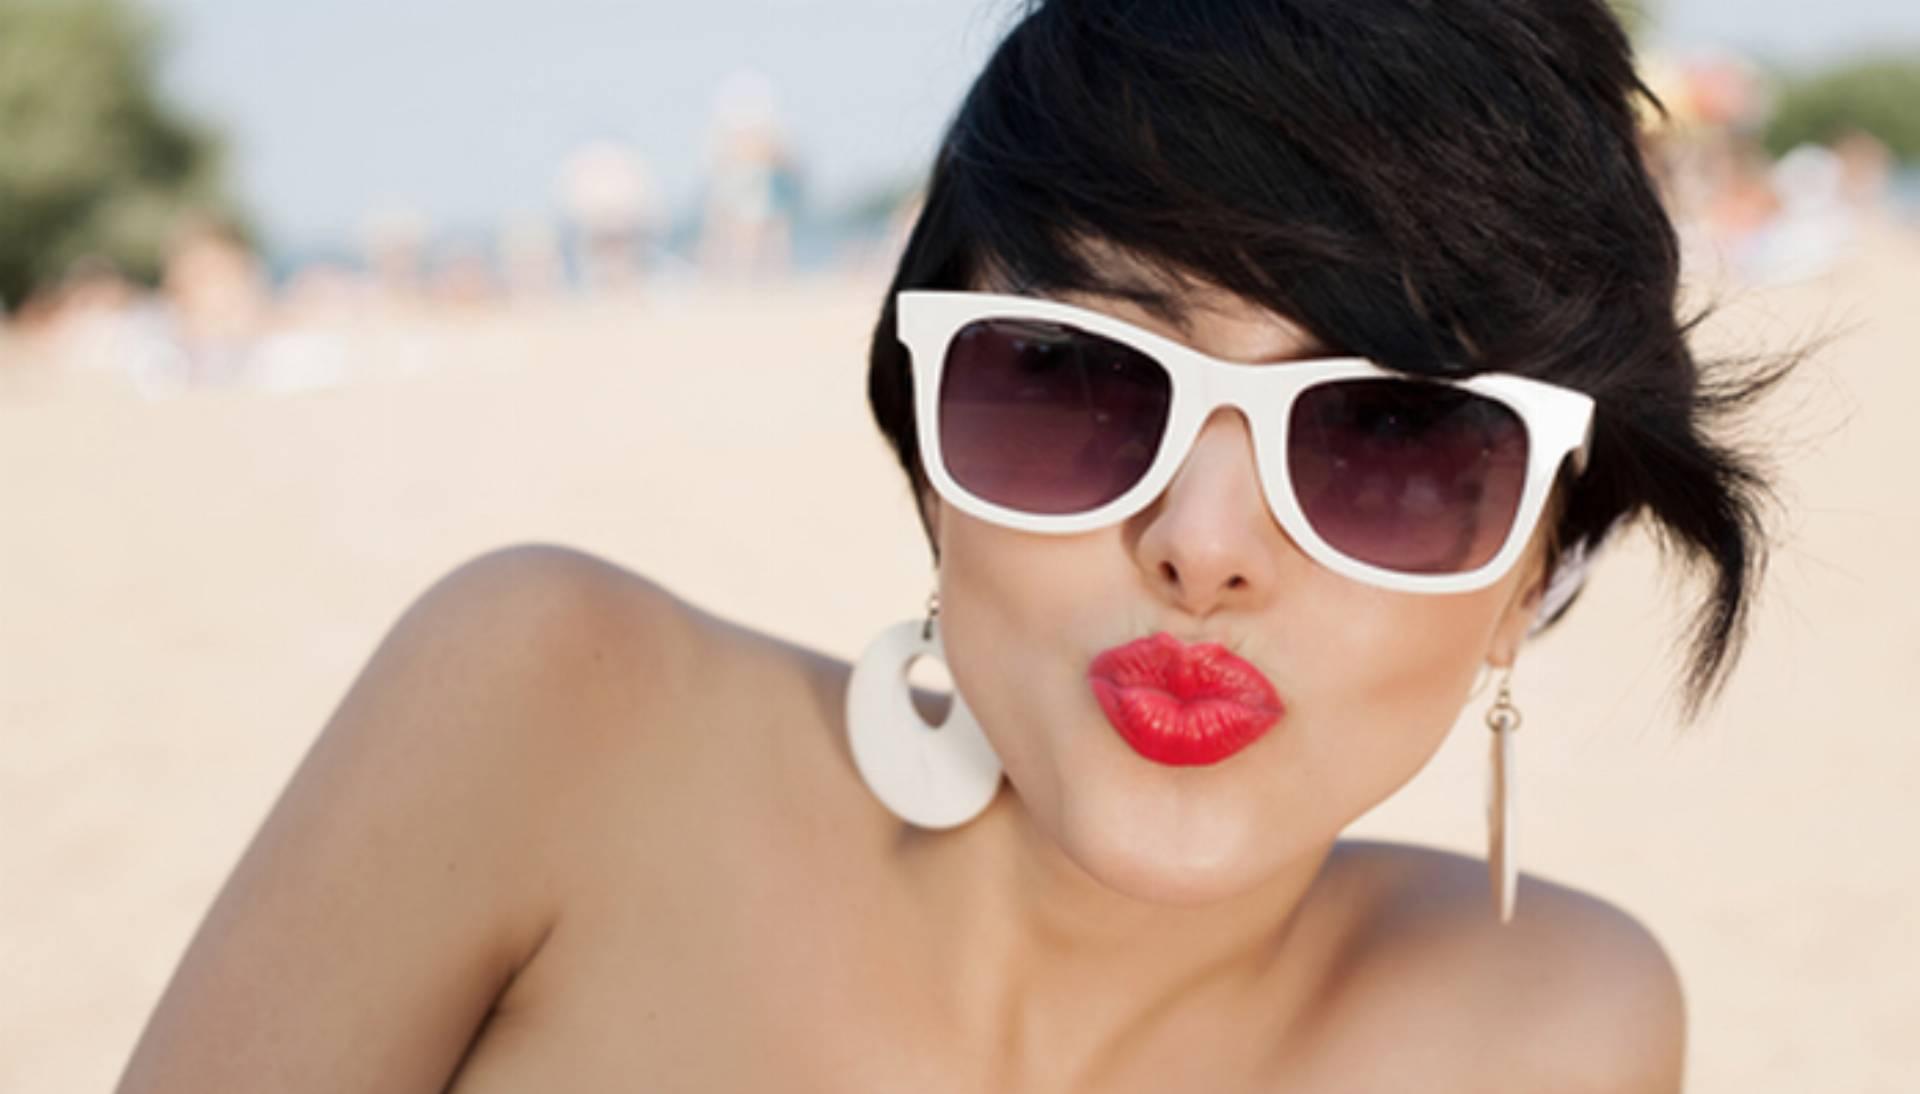 lato, kobiera, plaża, opalanie, skóra, usta, okulary